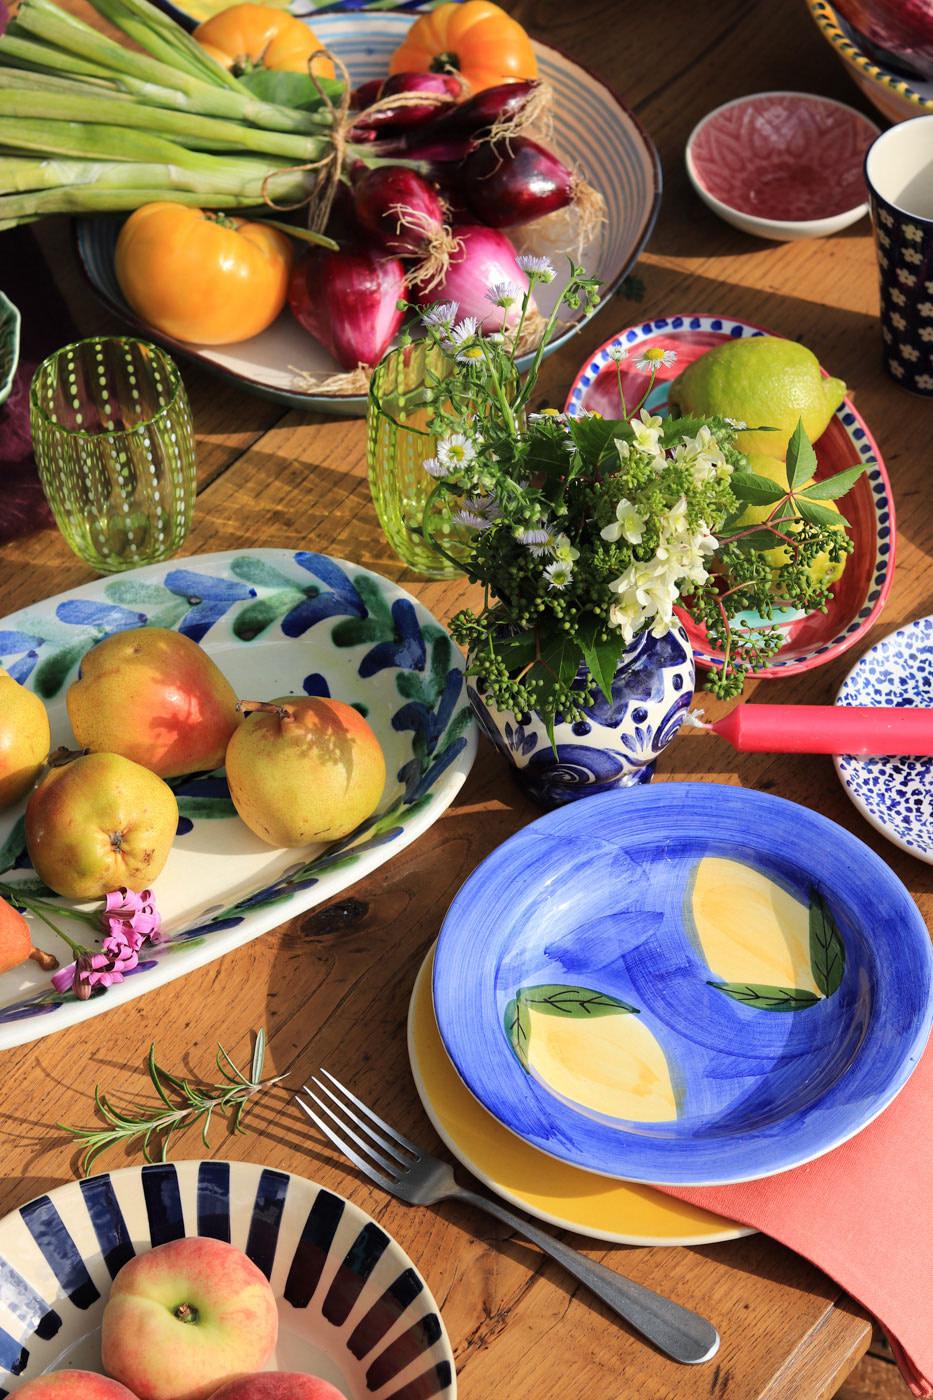 dresser-une-table-italienne-vaisselle